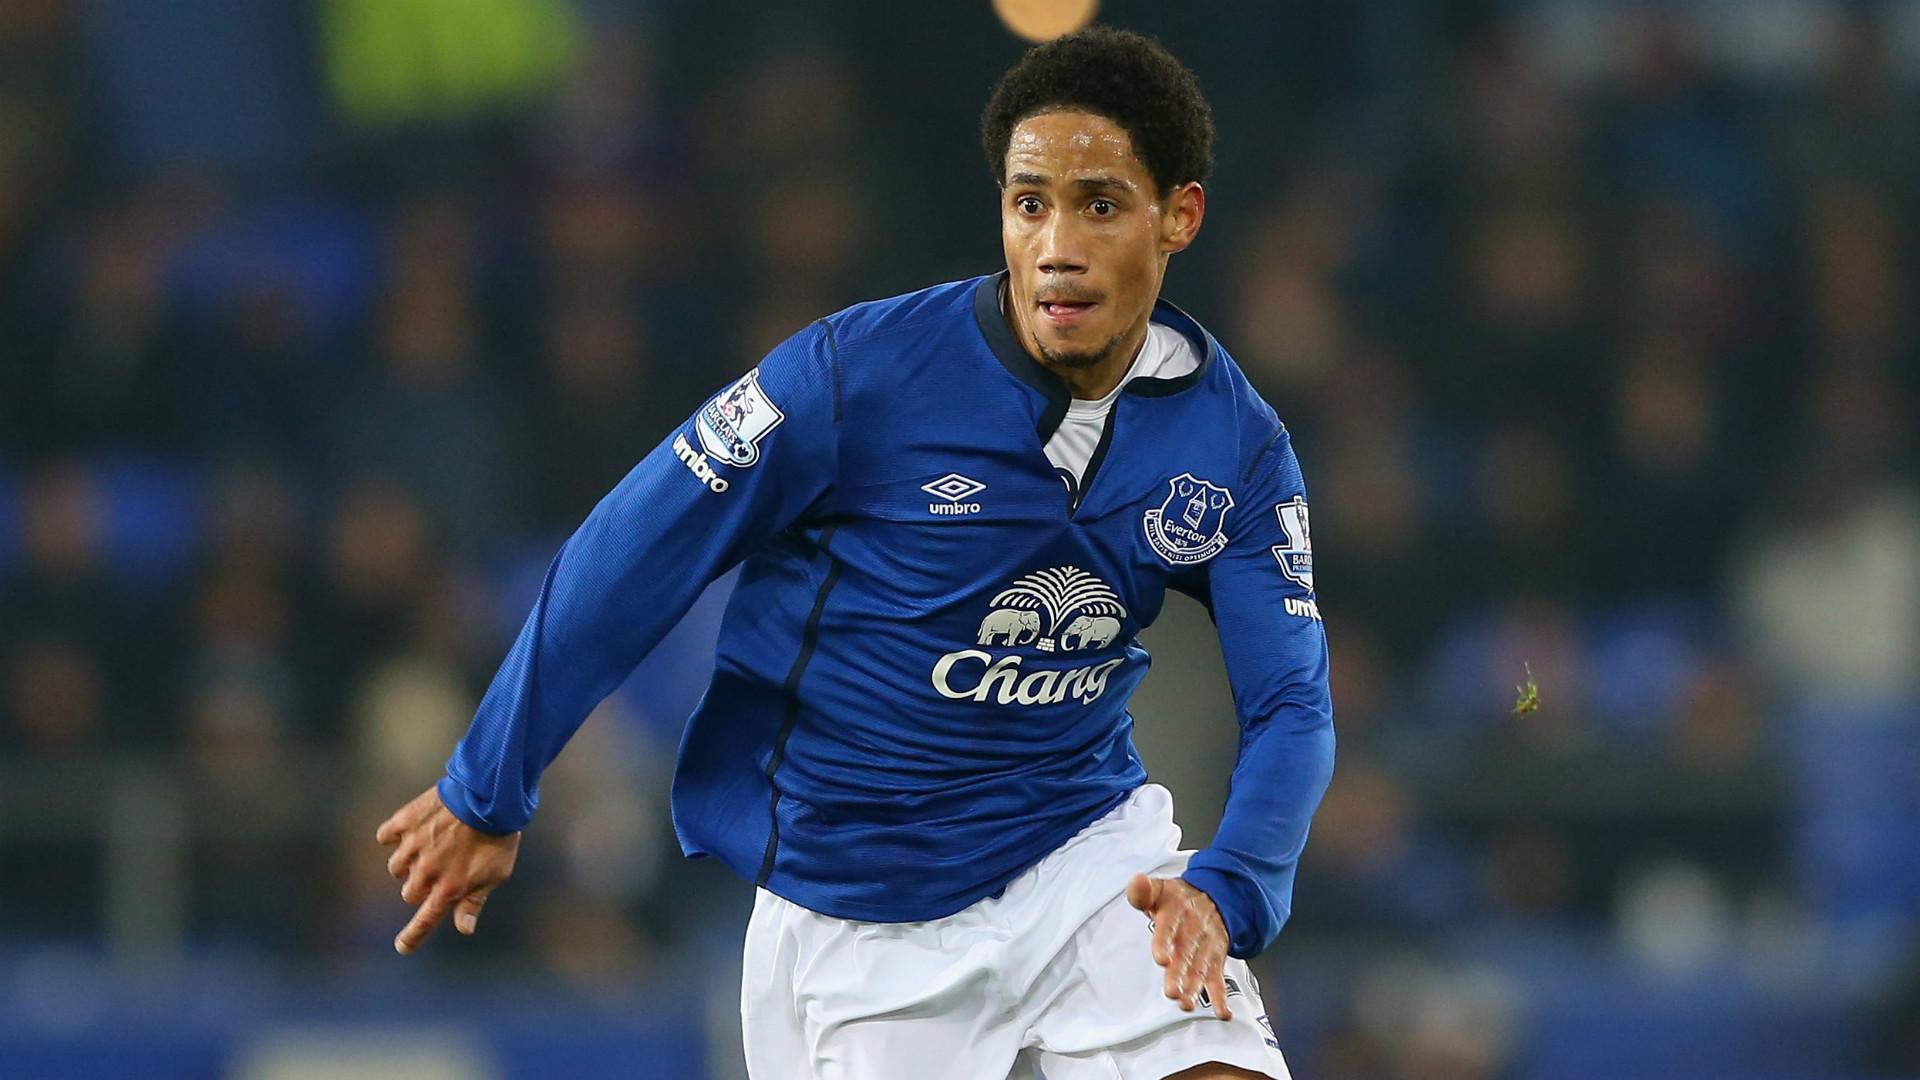 Pienaar names Yobo among players who made him settle at Everton